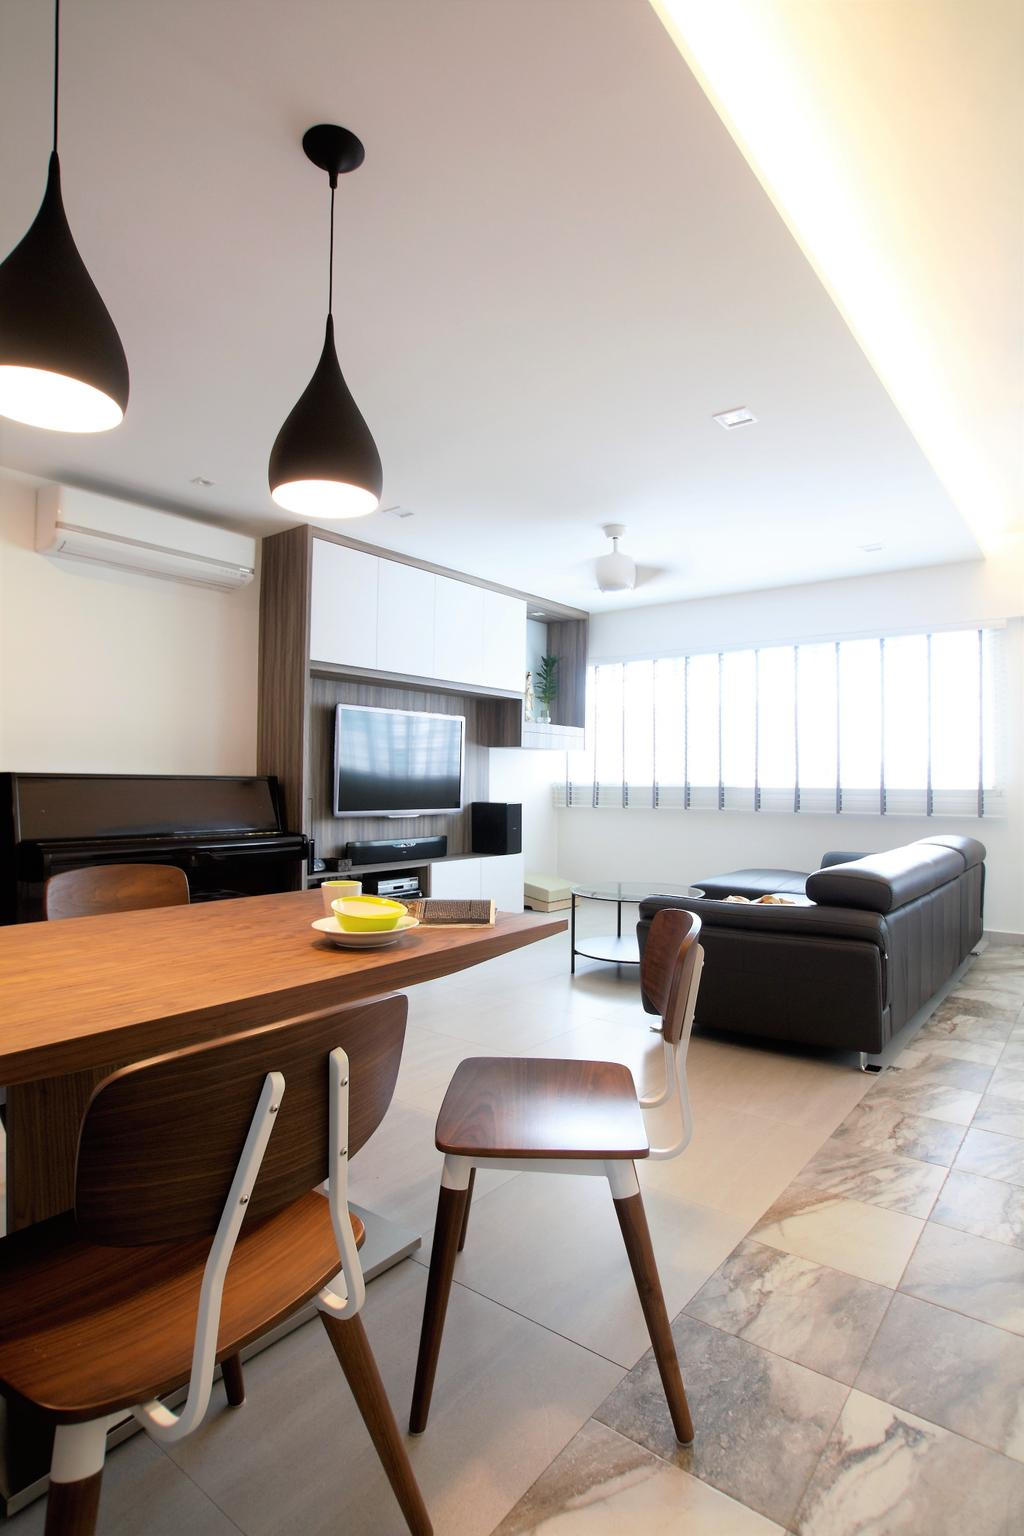 Scandinavian, HDB, Bukit Batok, Interior Designer, Intrigue-d Design Consultancy, Sink, Electronics, Entertainment Center, Home Theater, Couch, Furniture